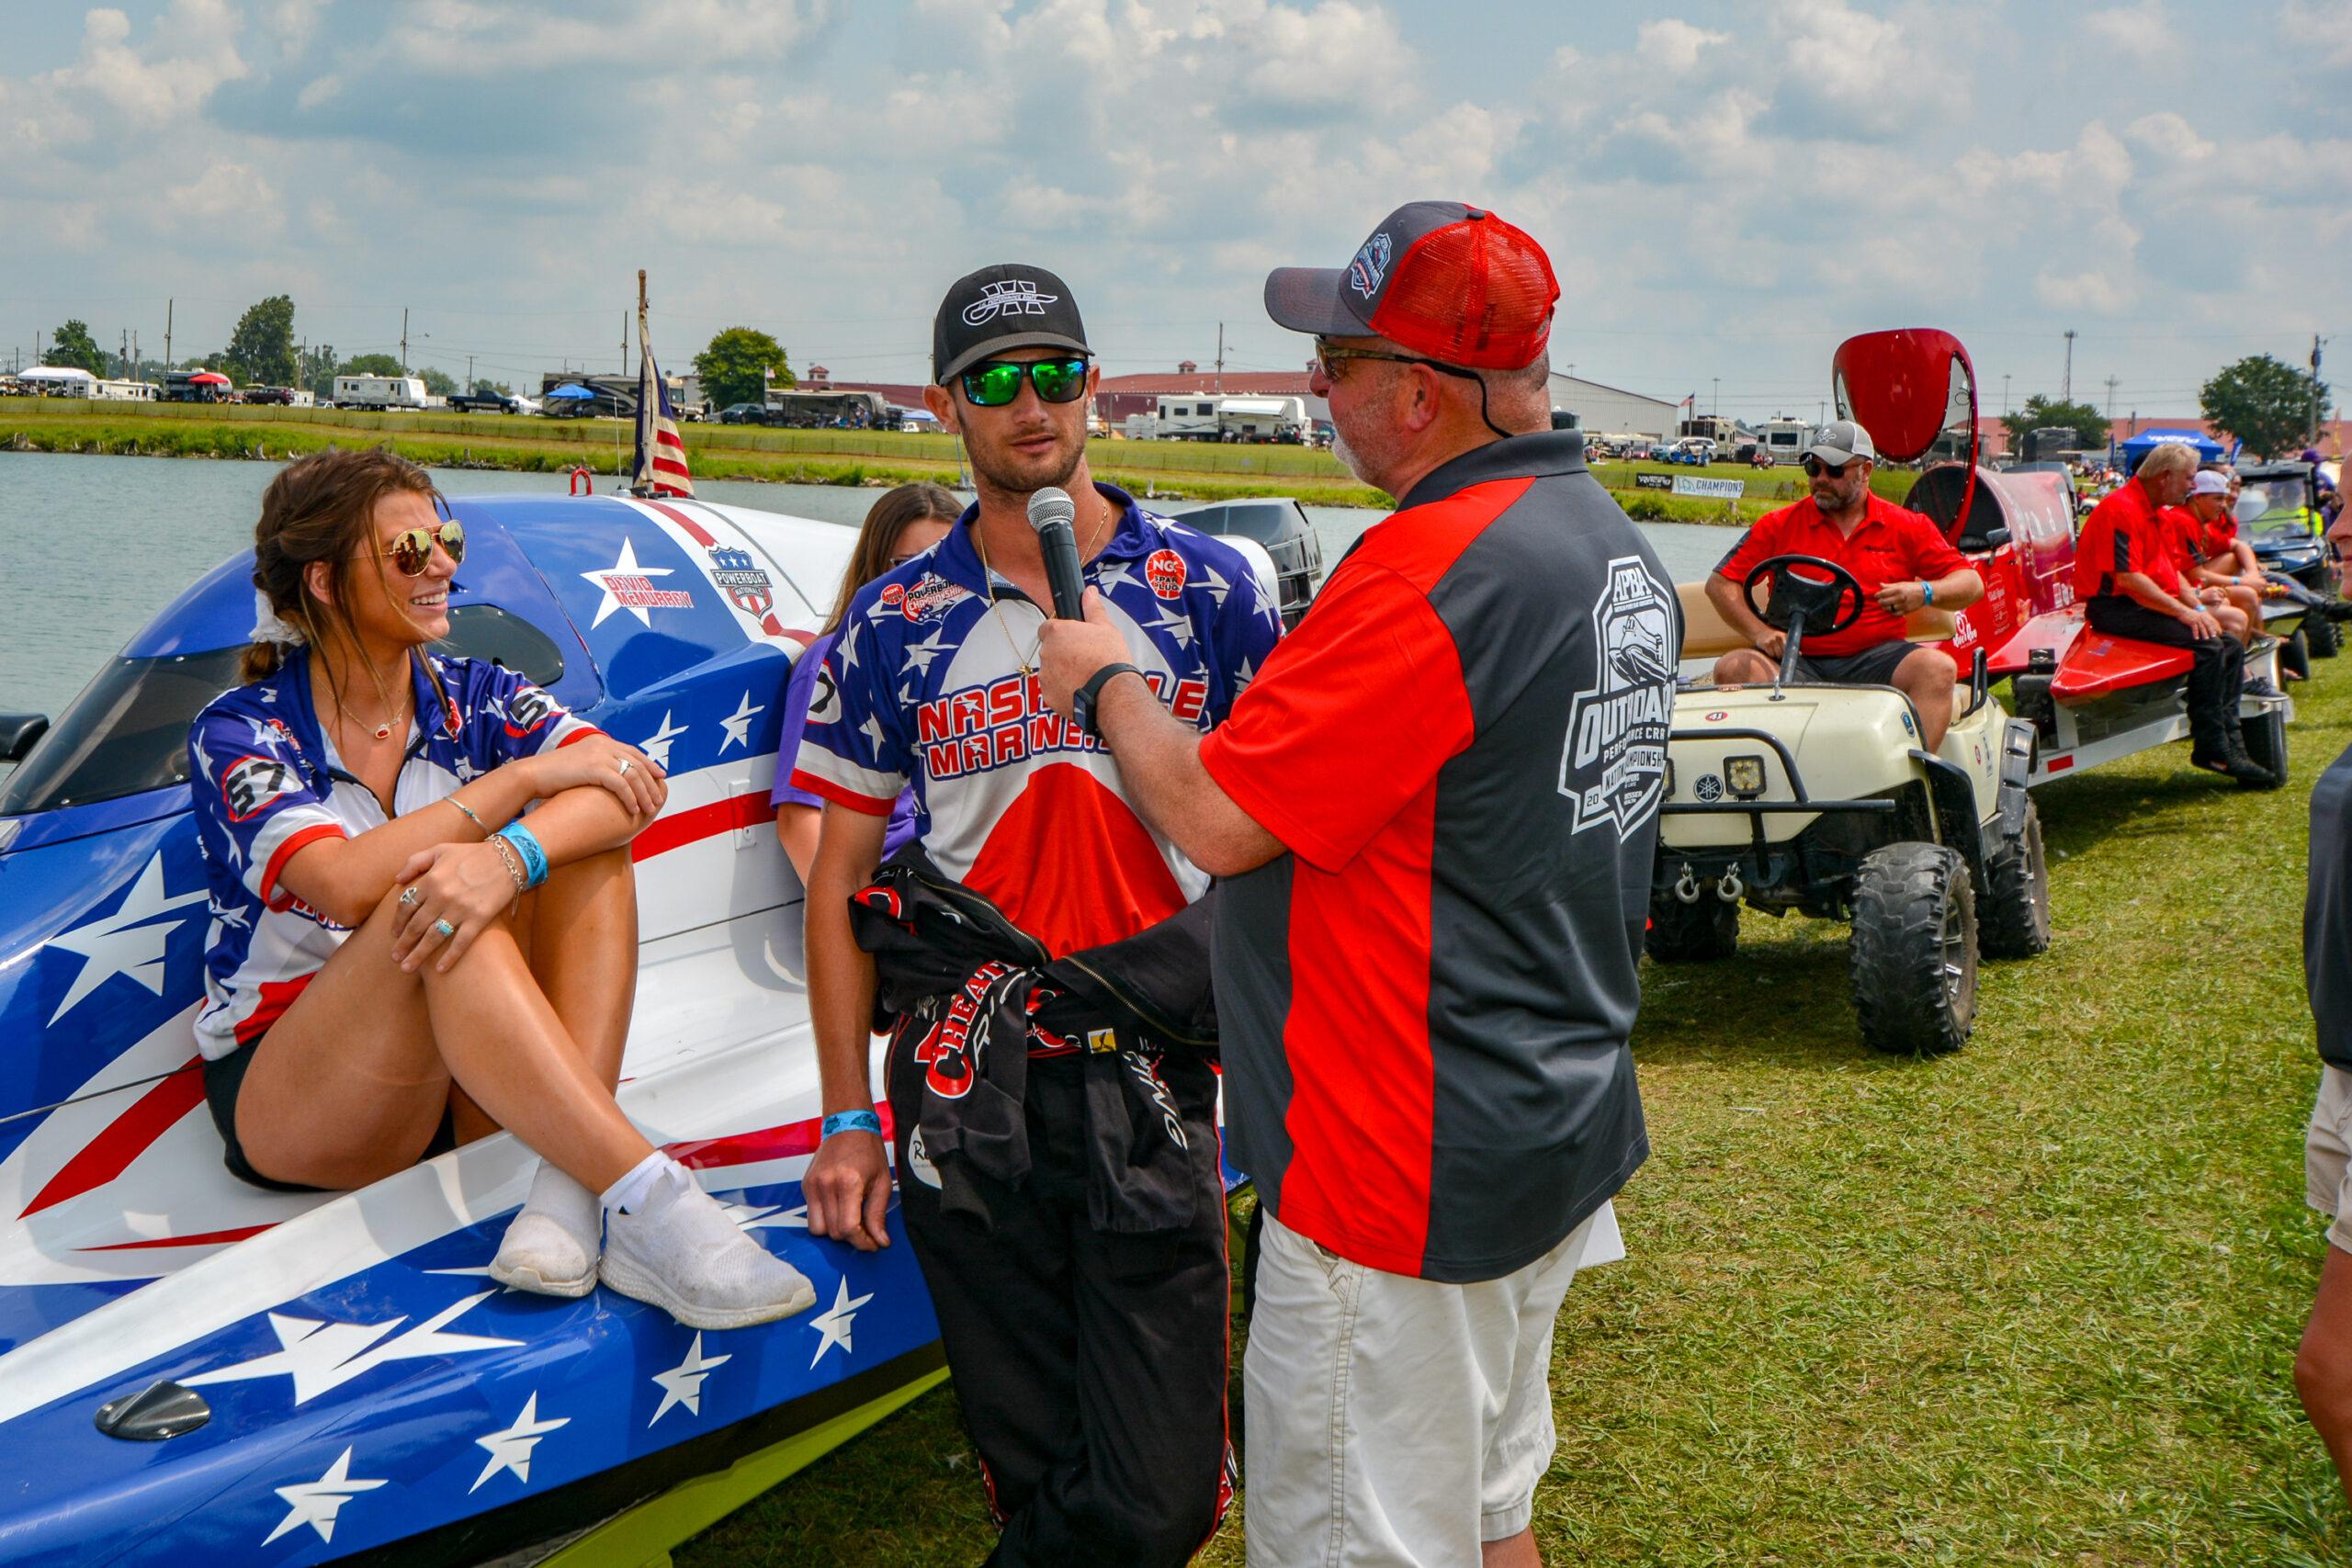 McMurray Racing Nashville Marine 2021 Springfield F1 Race-49